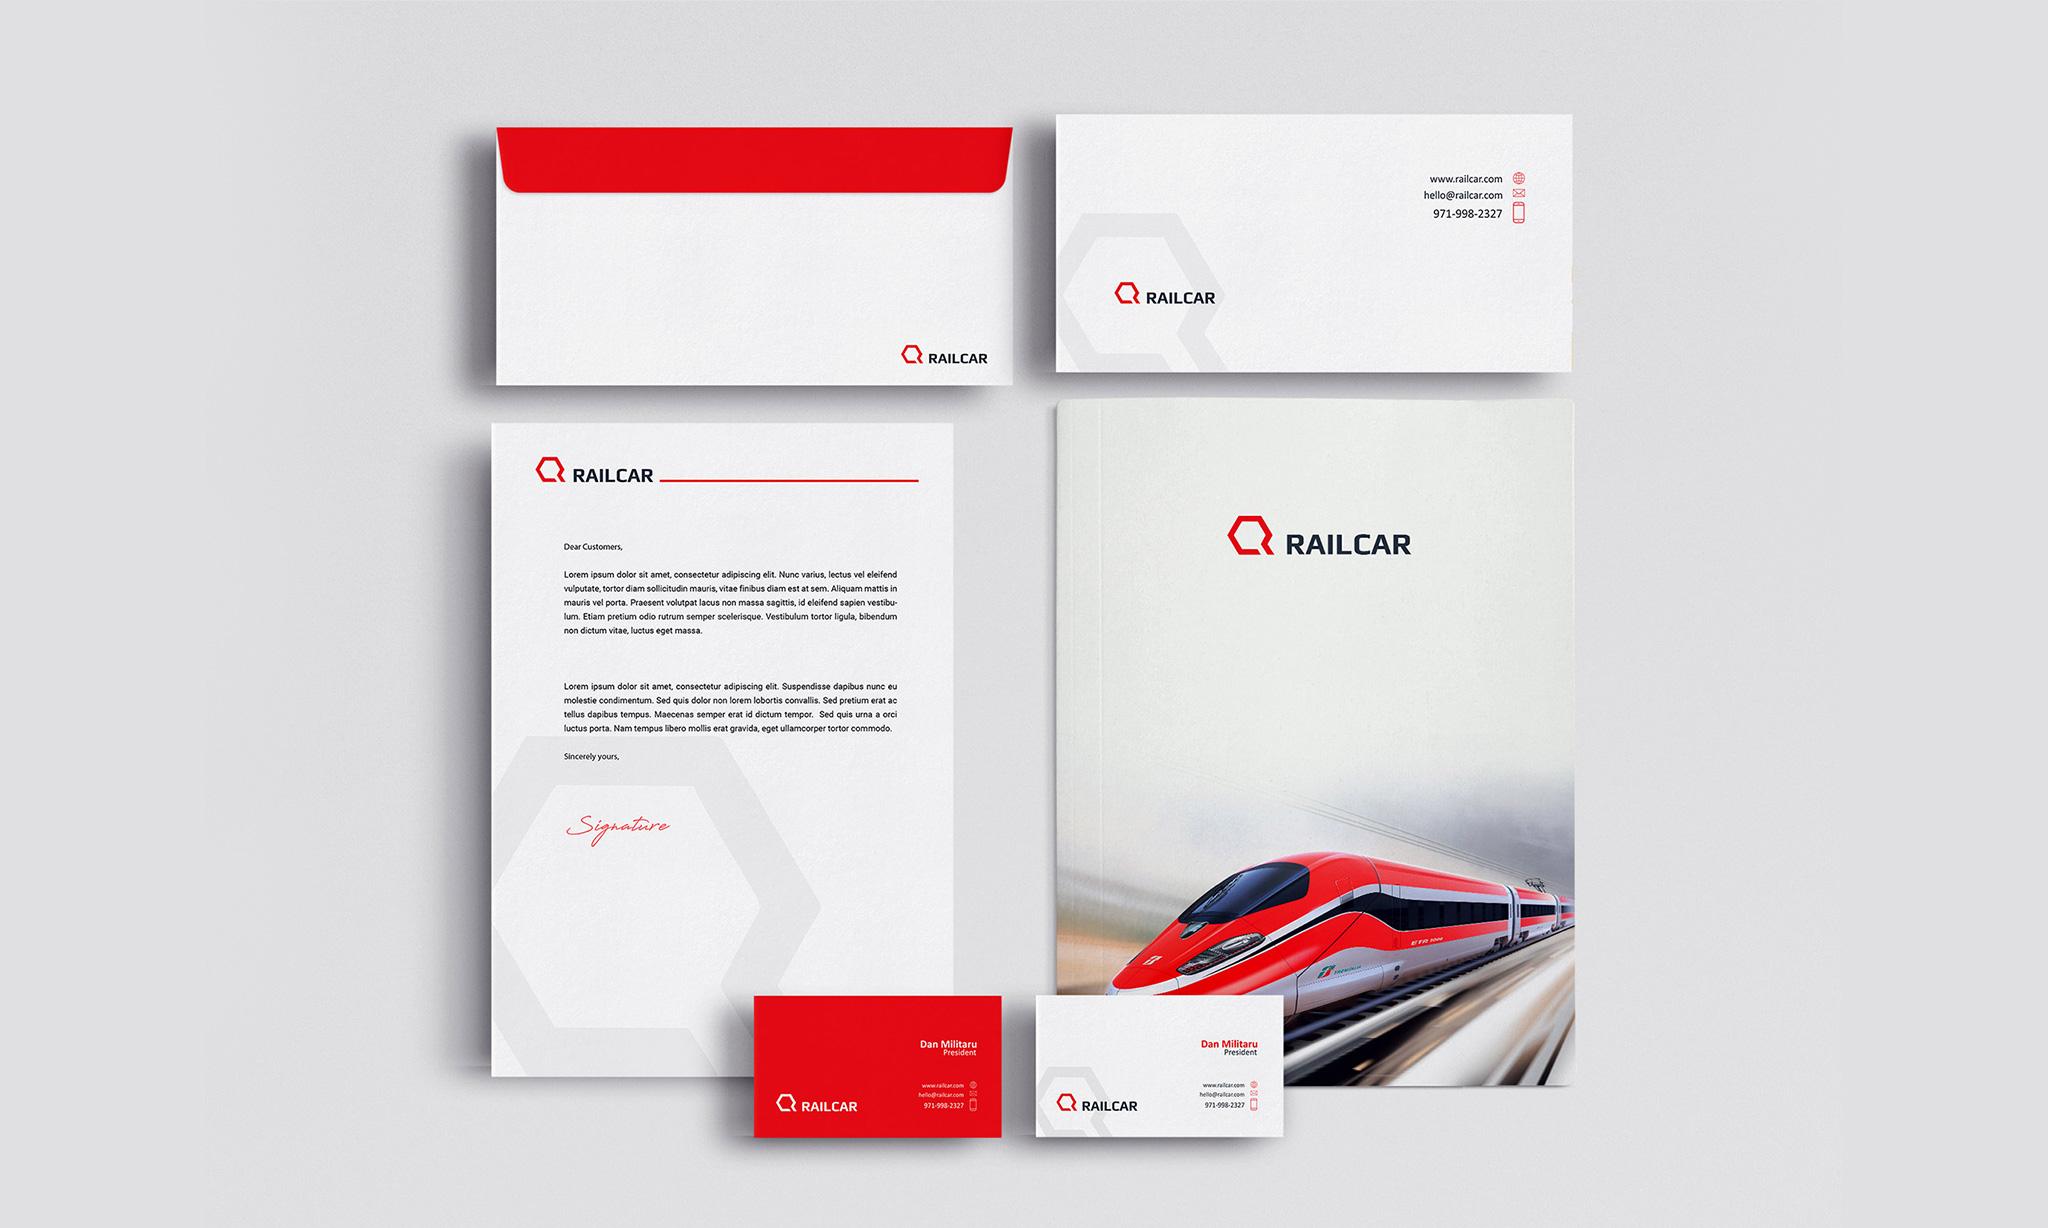 identitate-vizuala-railcar